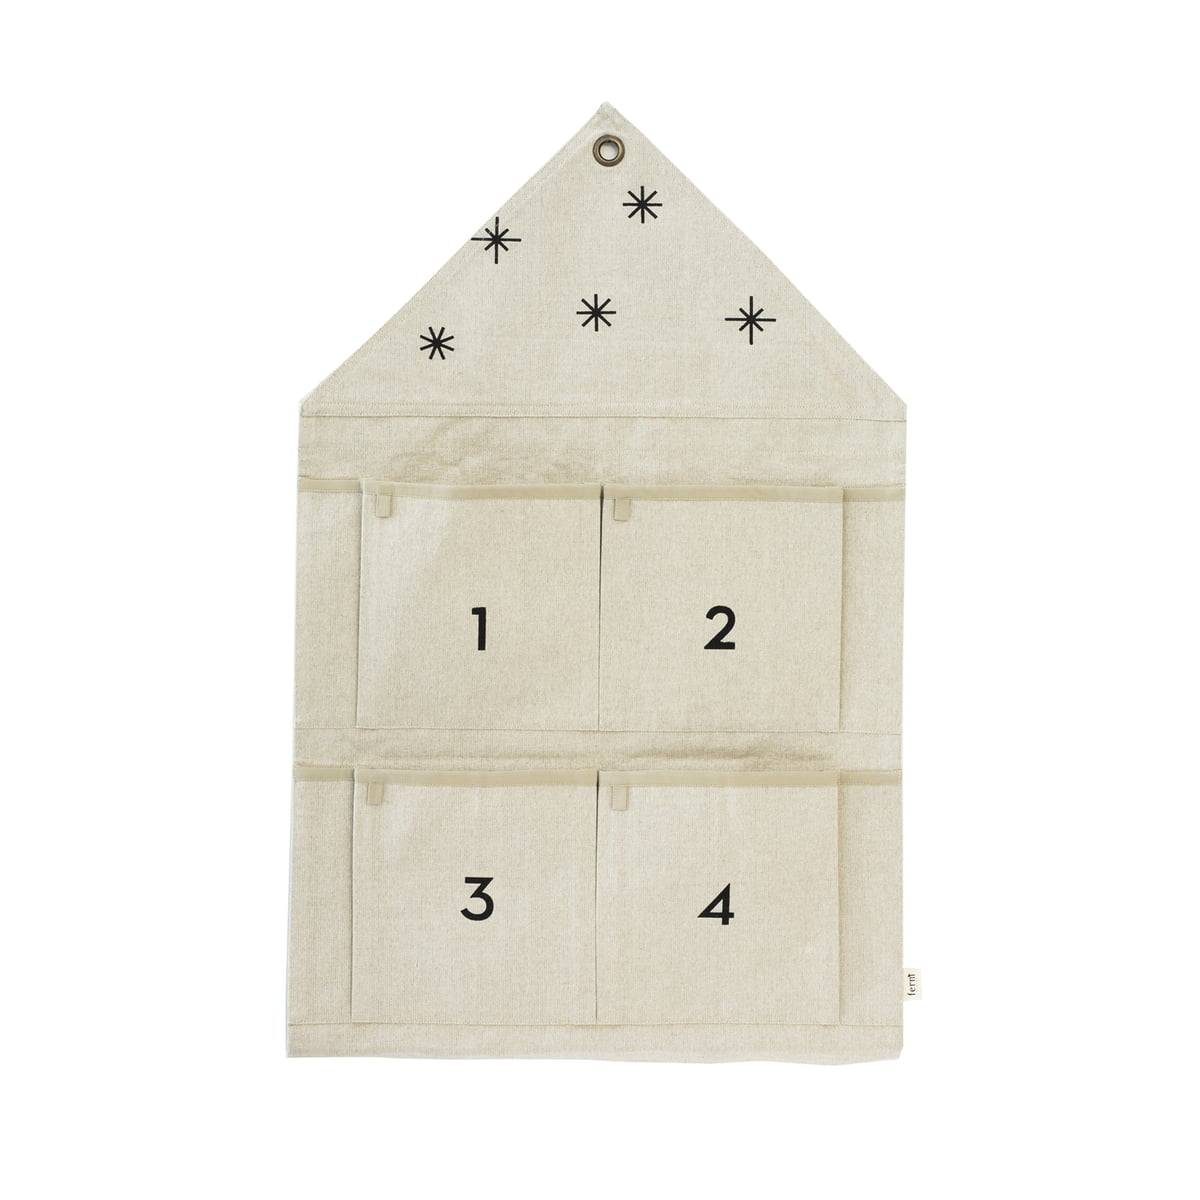 ferm LIVING - House Adventskalender 4 Fächer, sand